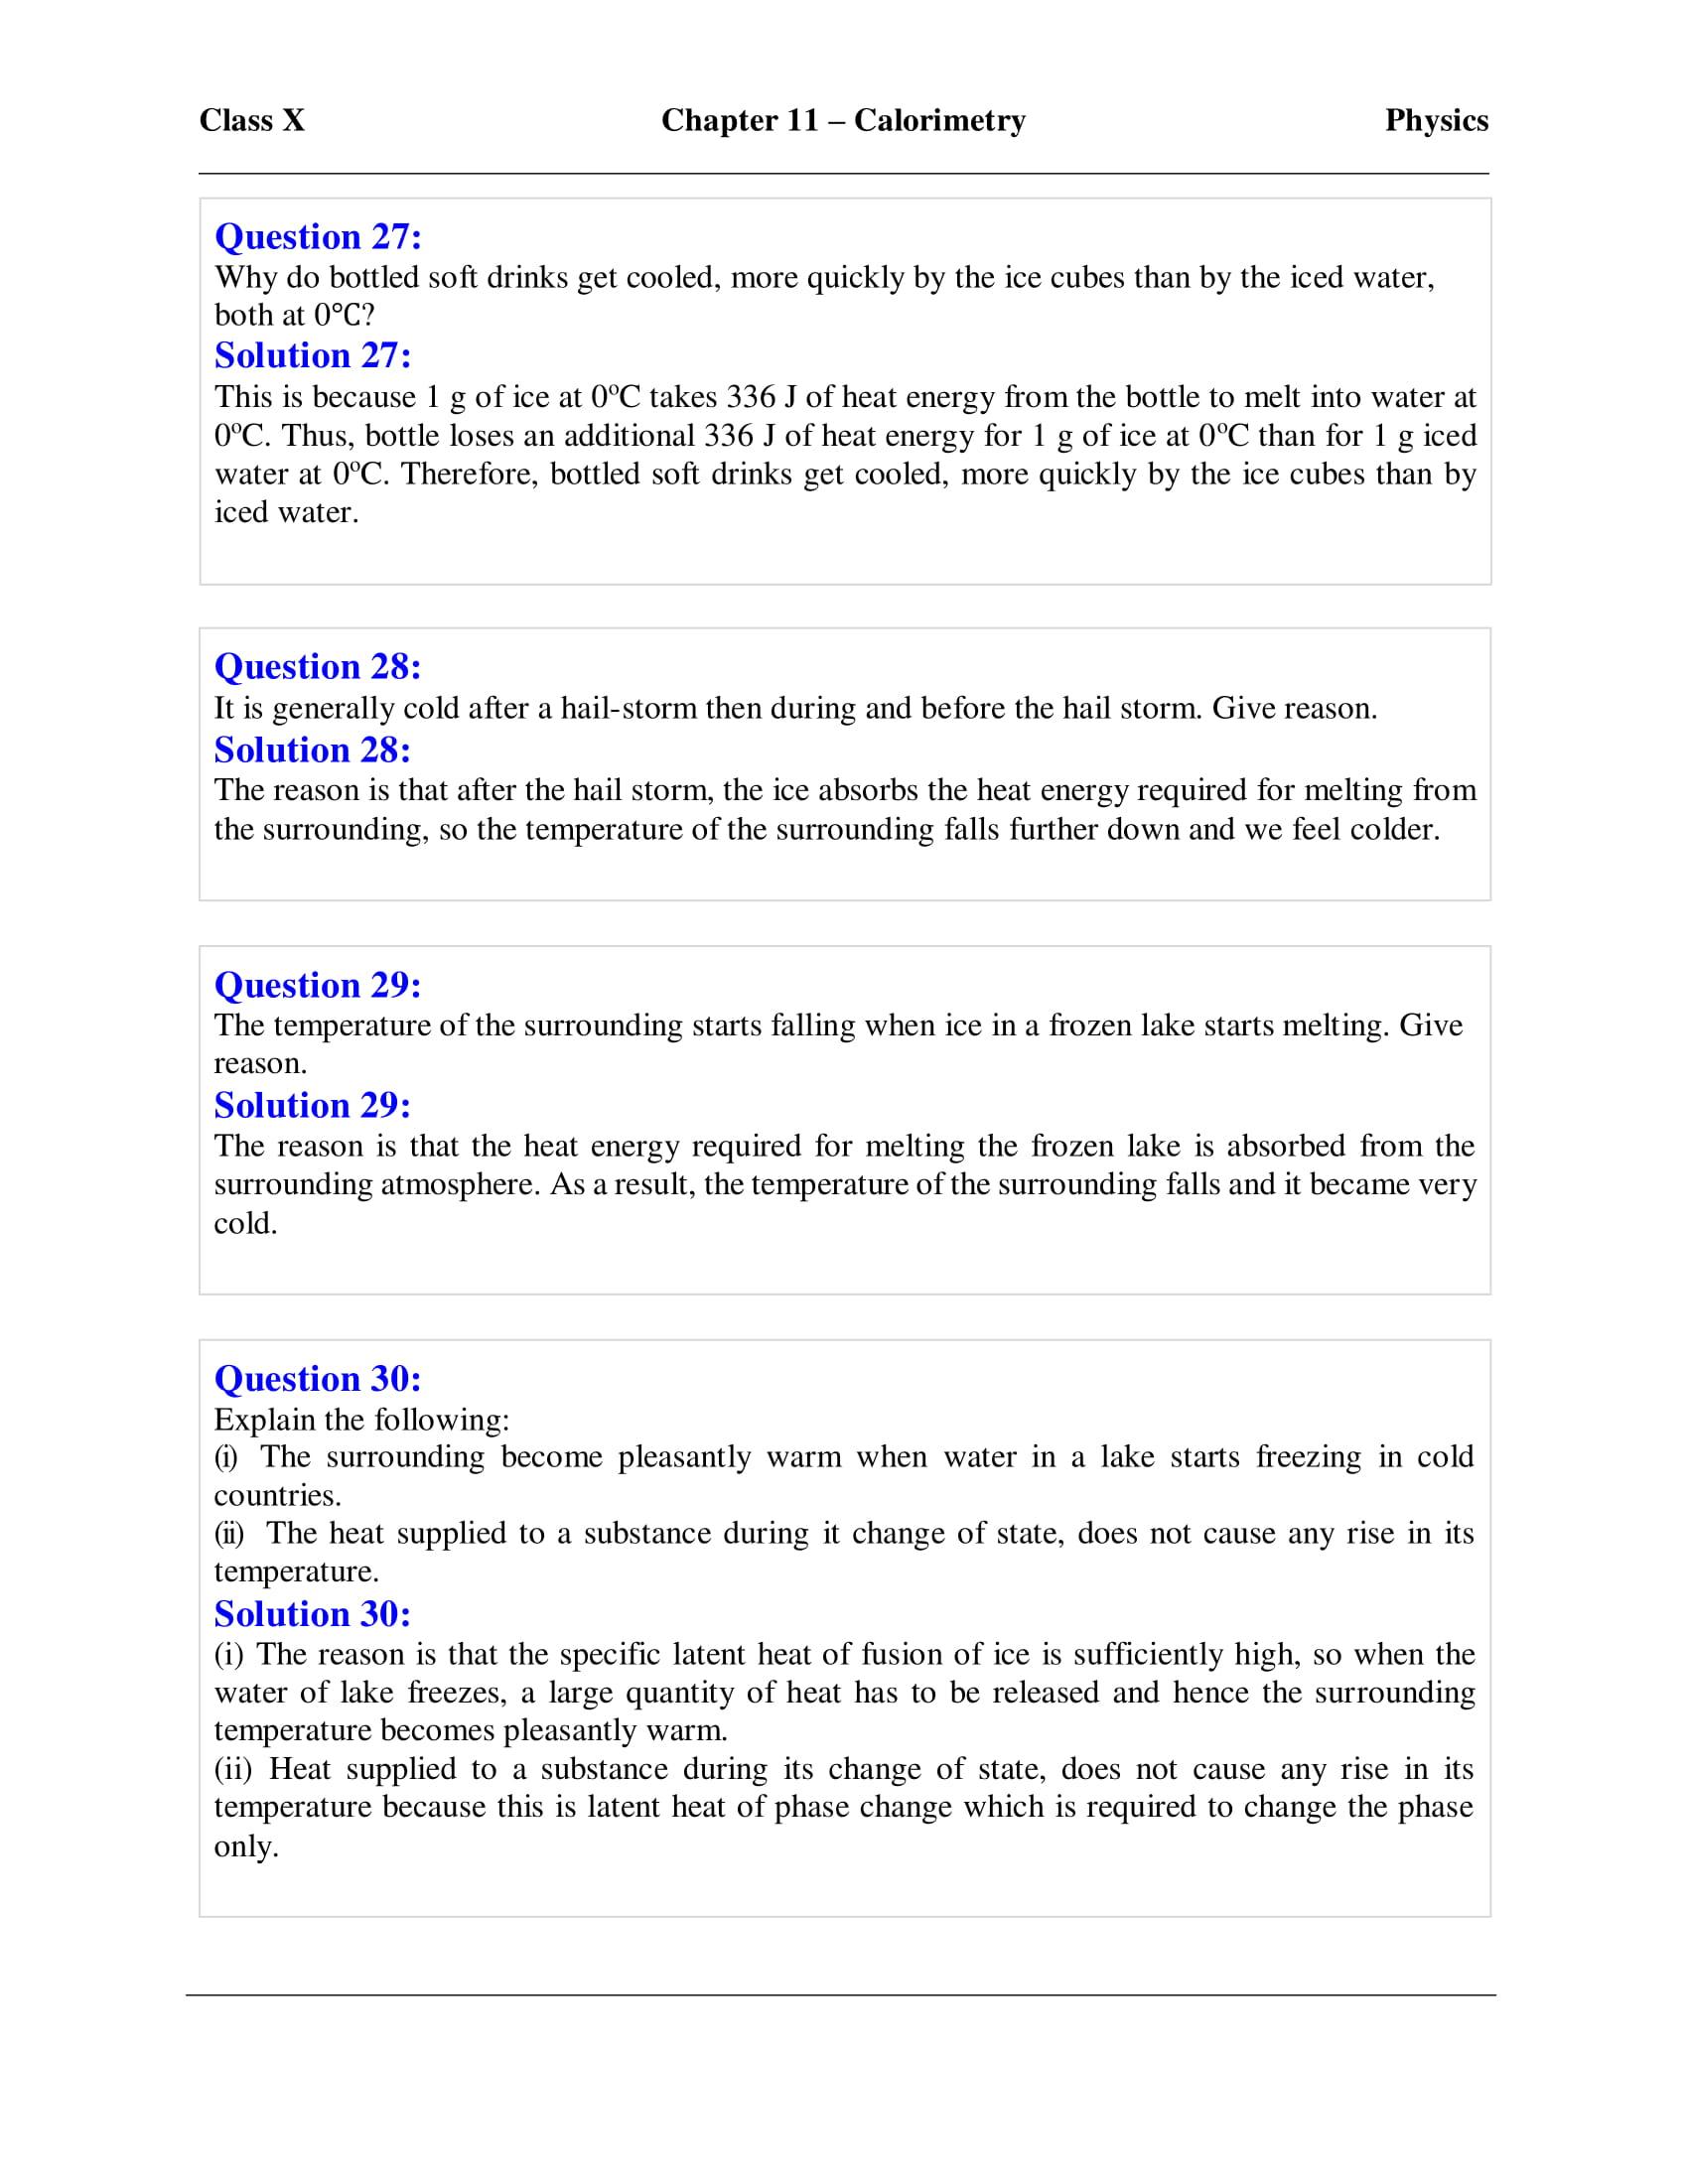 icse-selina-physics-solutions-class-10-chapter-11-calorimetry-24